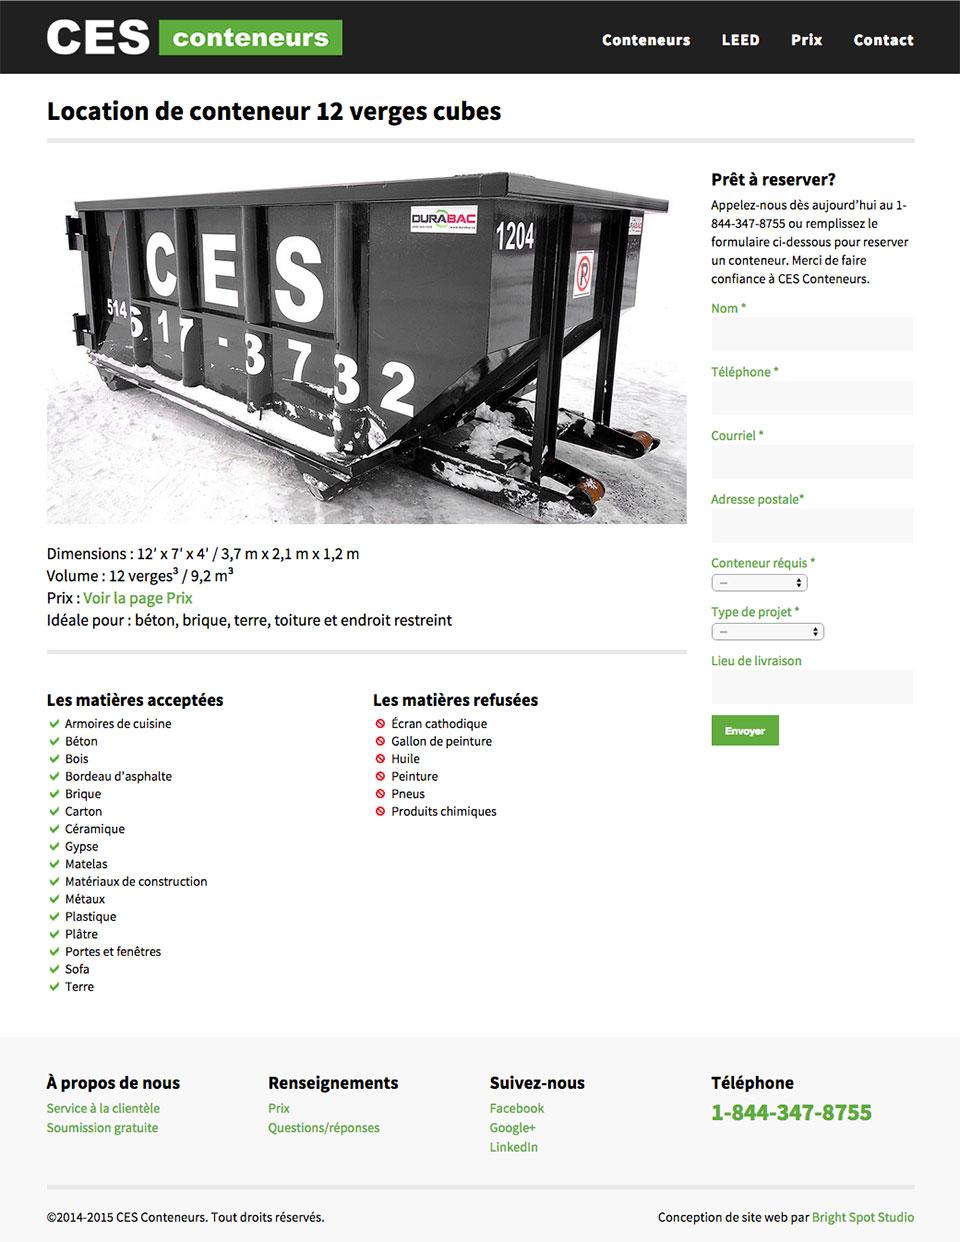 CES Conteneurs website redesign by Bright Spot Studio